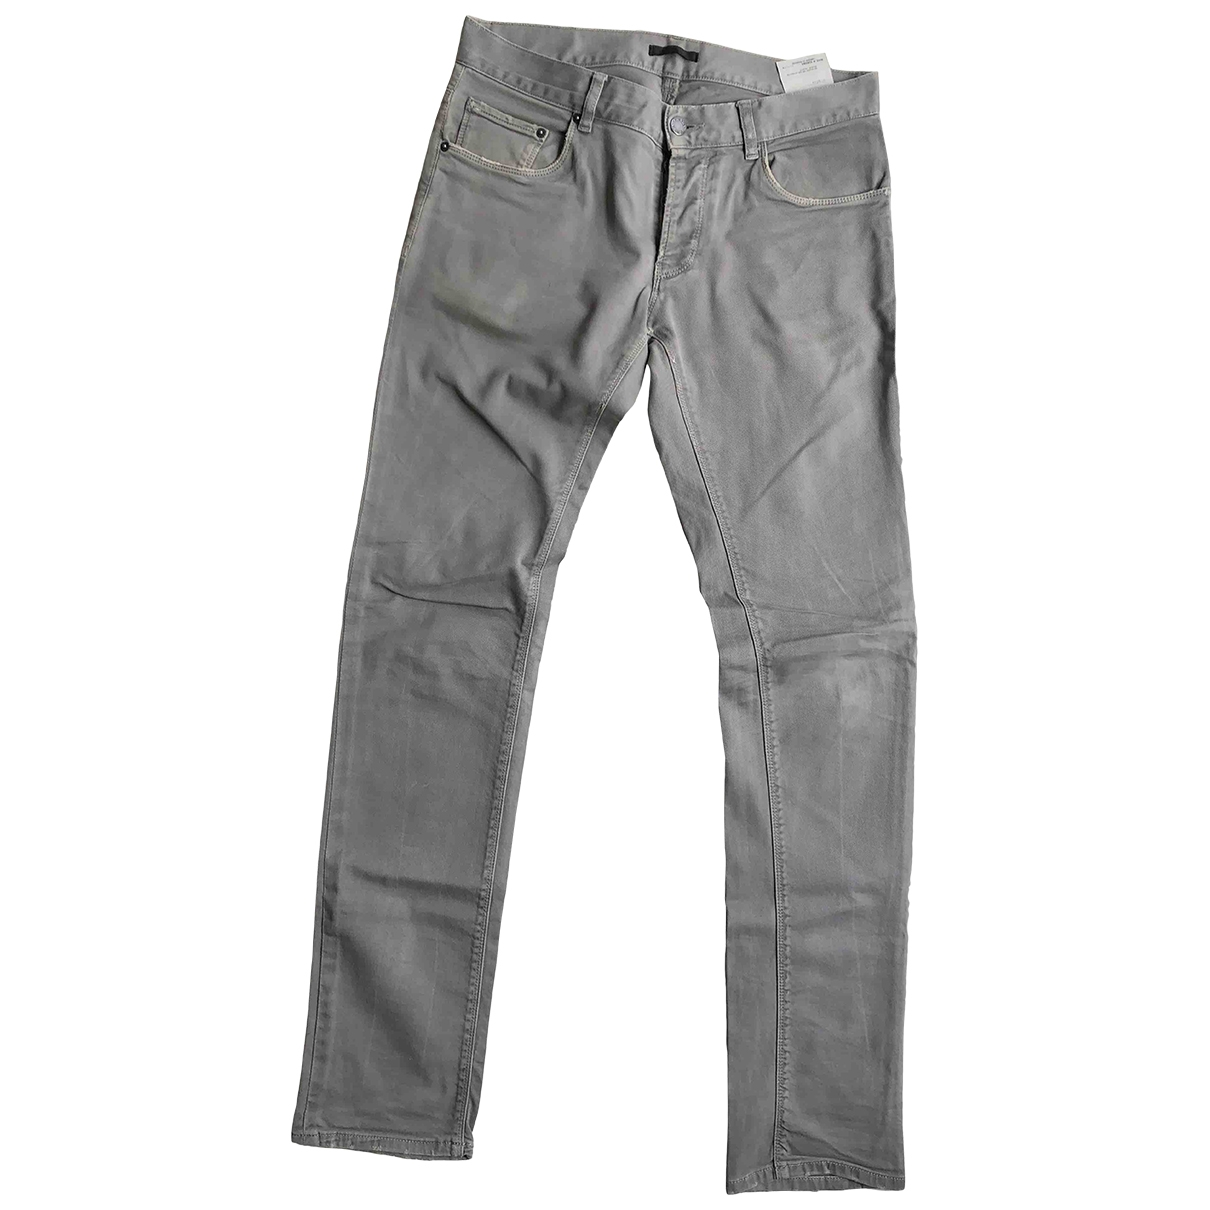 Prada \N Grey Cotton - elasthane Jeans for Men 31 US